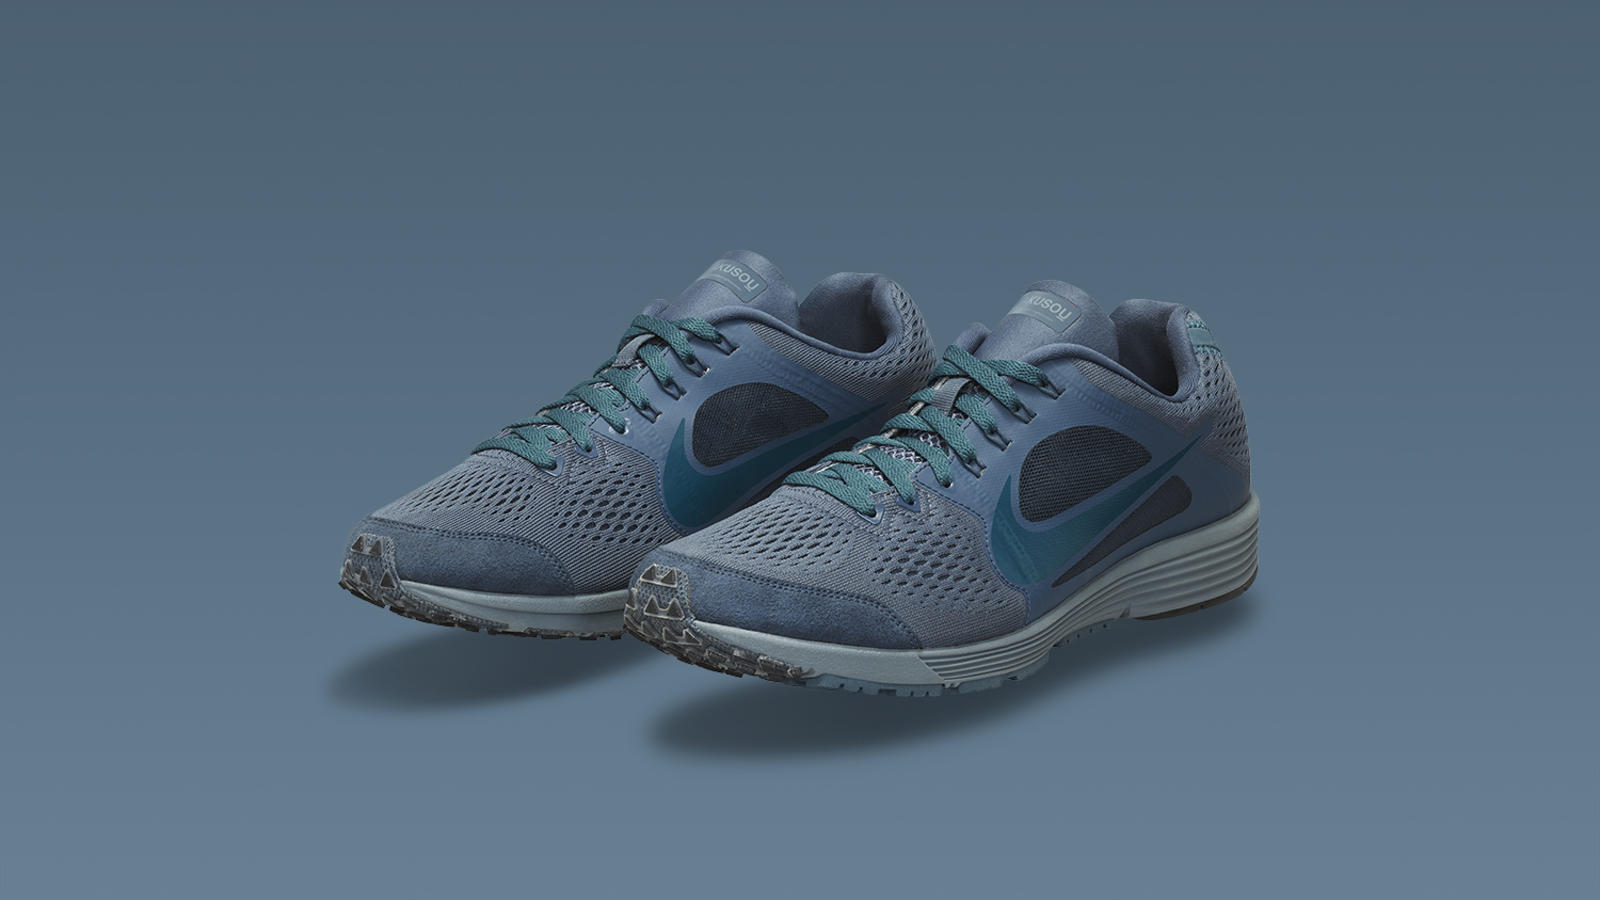 pics Nike x Undercover Gyakusou Holiday 2013 Collection